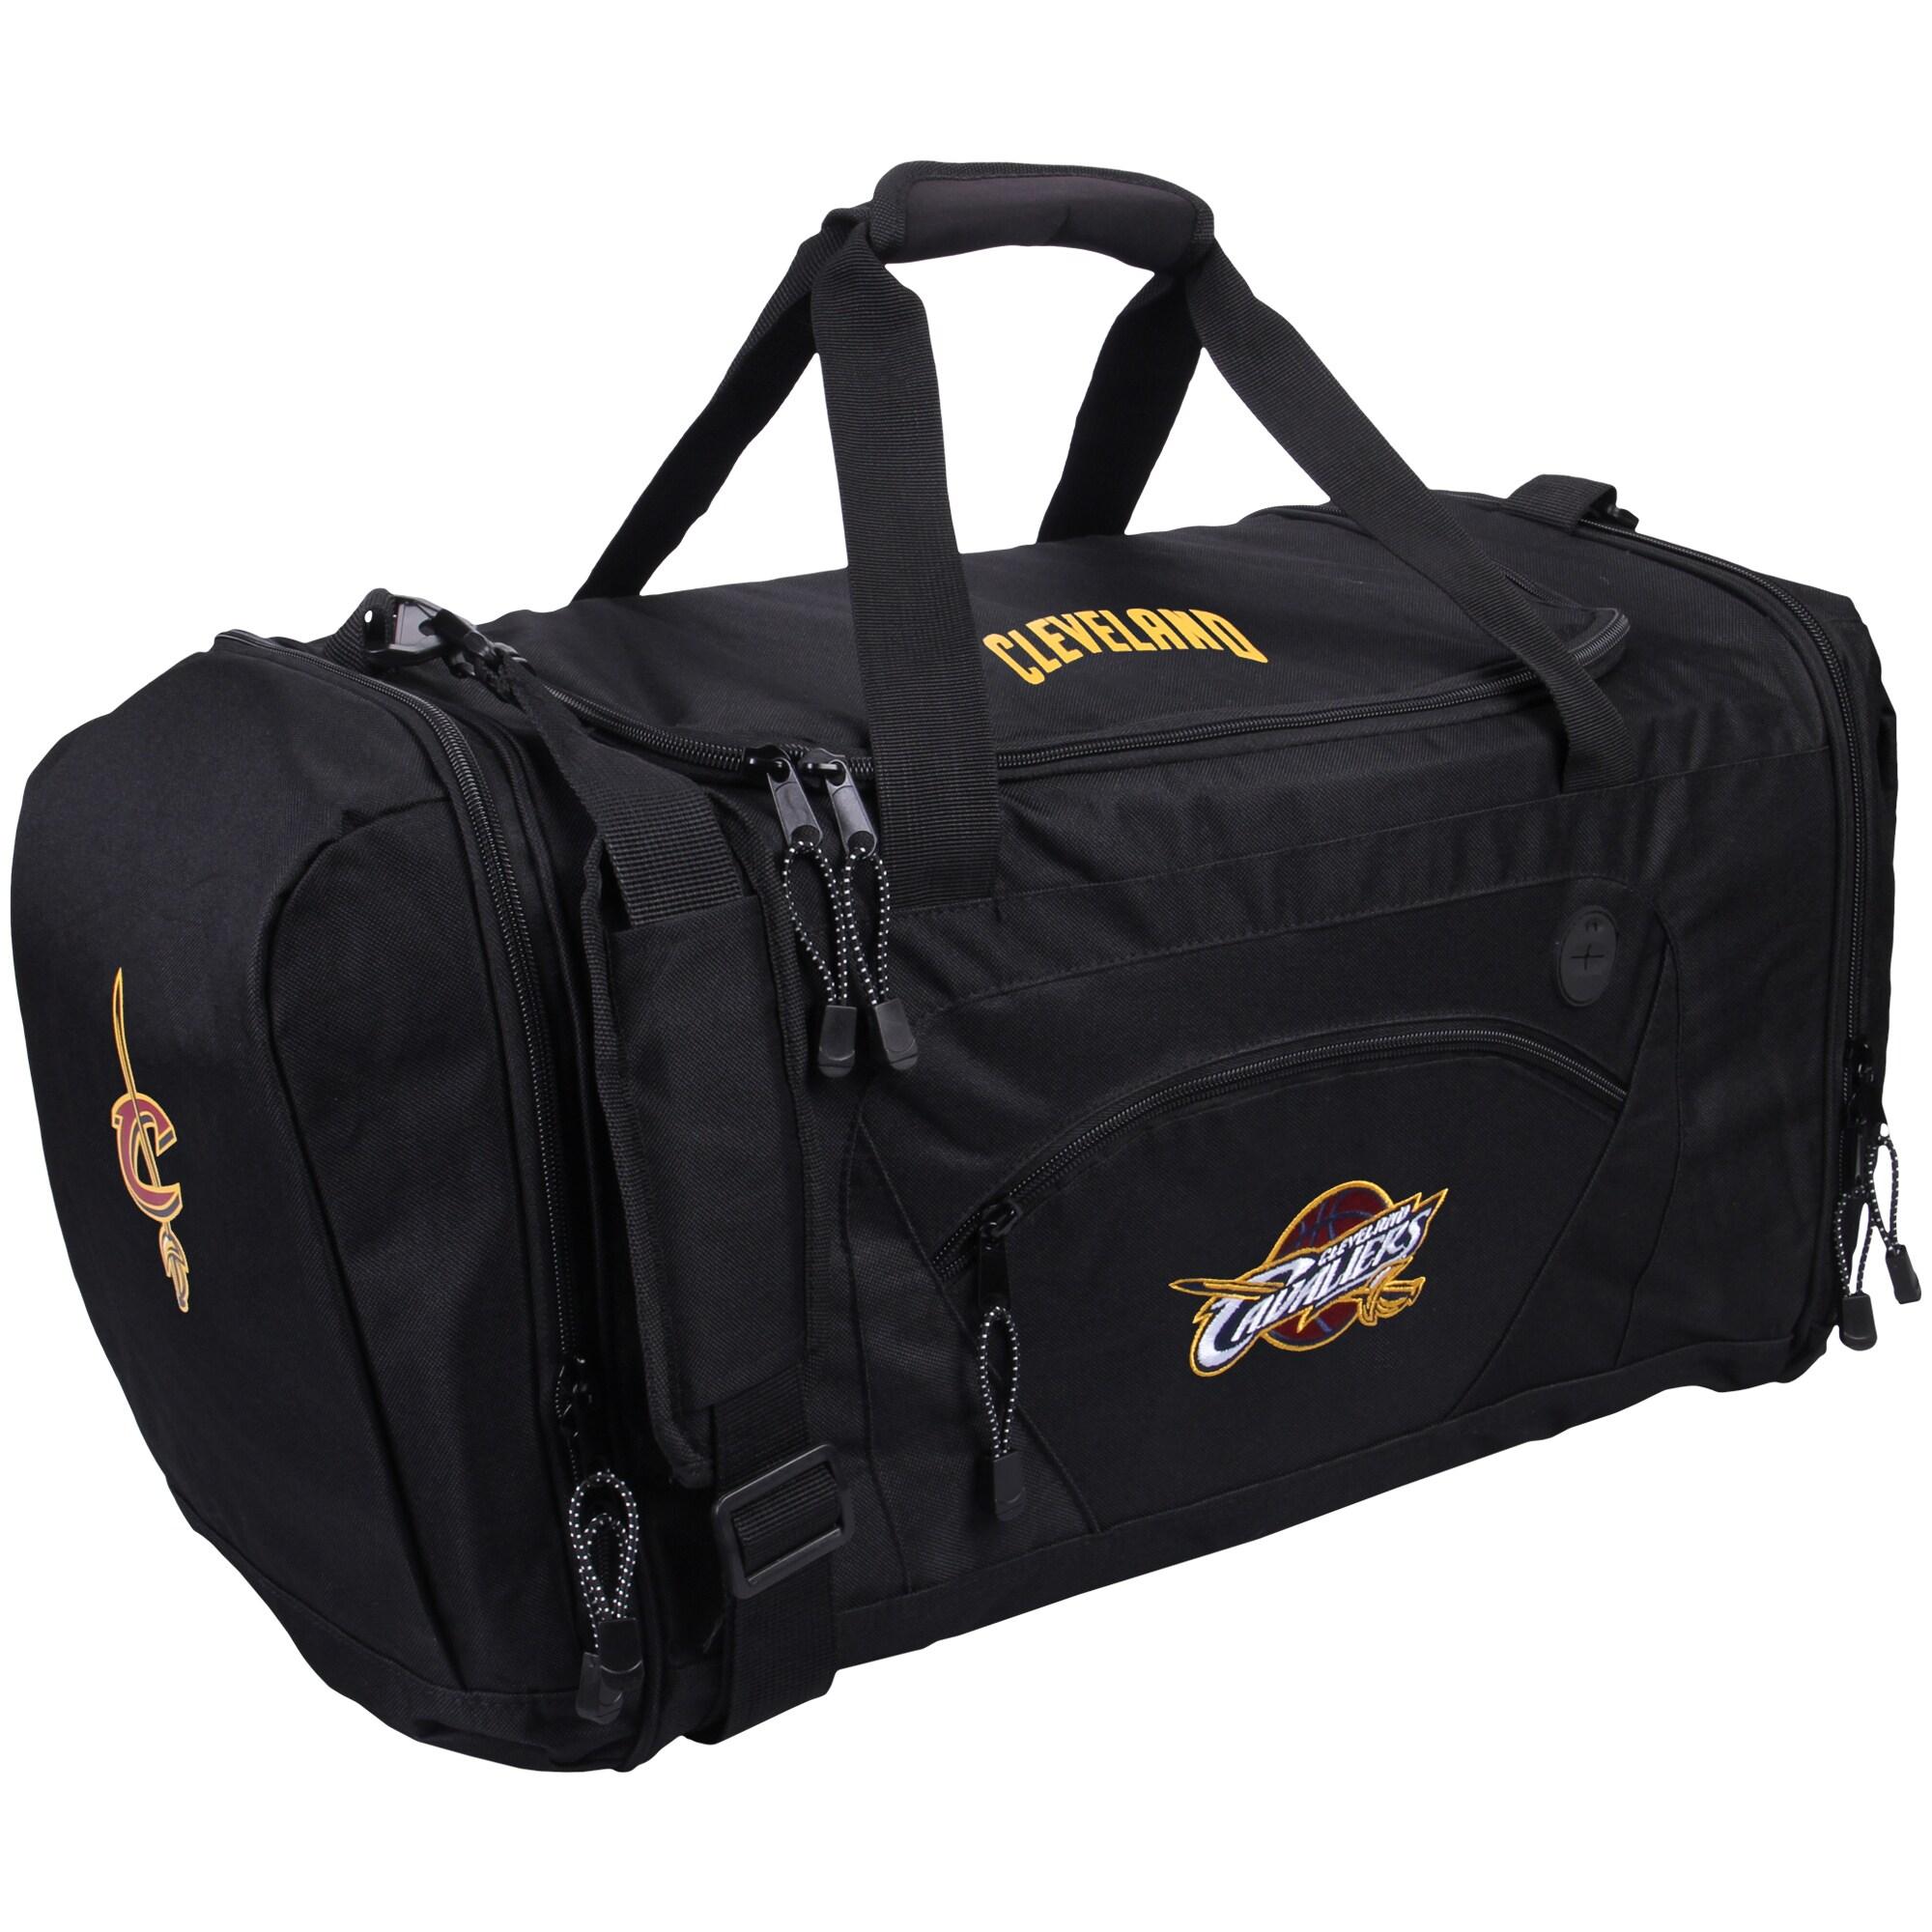 Cleveland Cavaliers The Northwest Company Roadblock Duffel Bag - Black